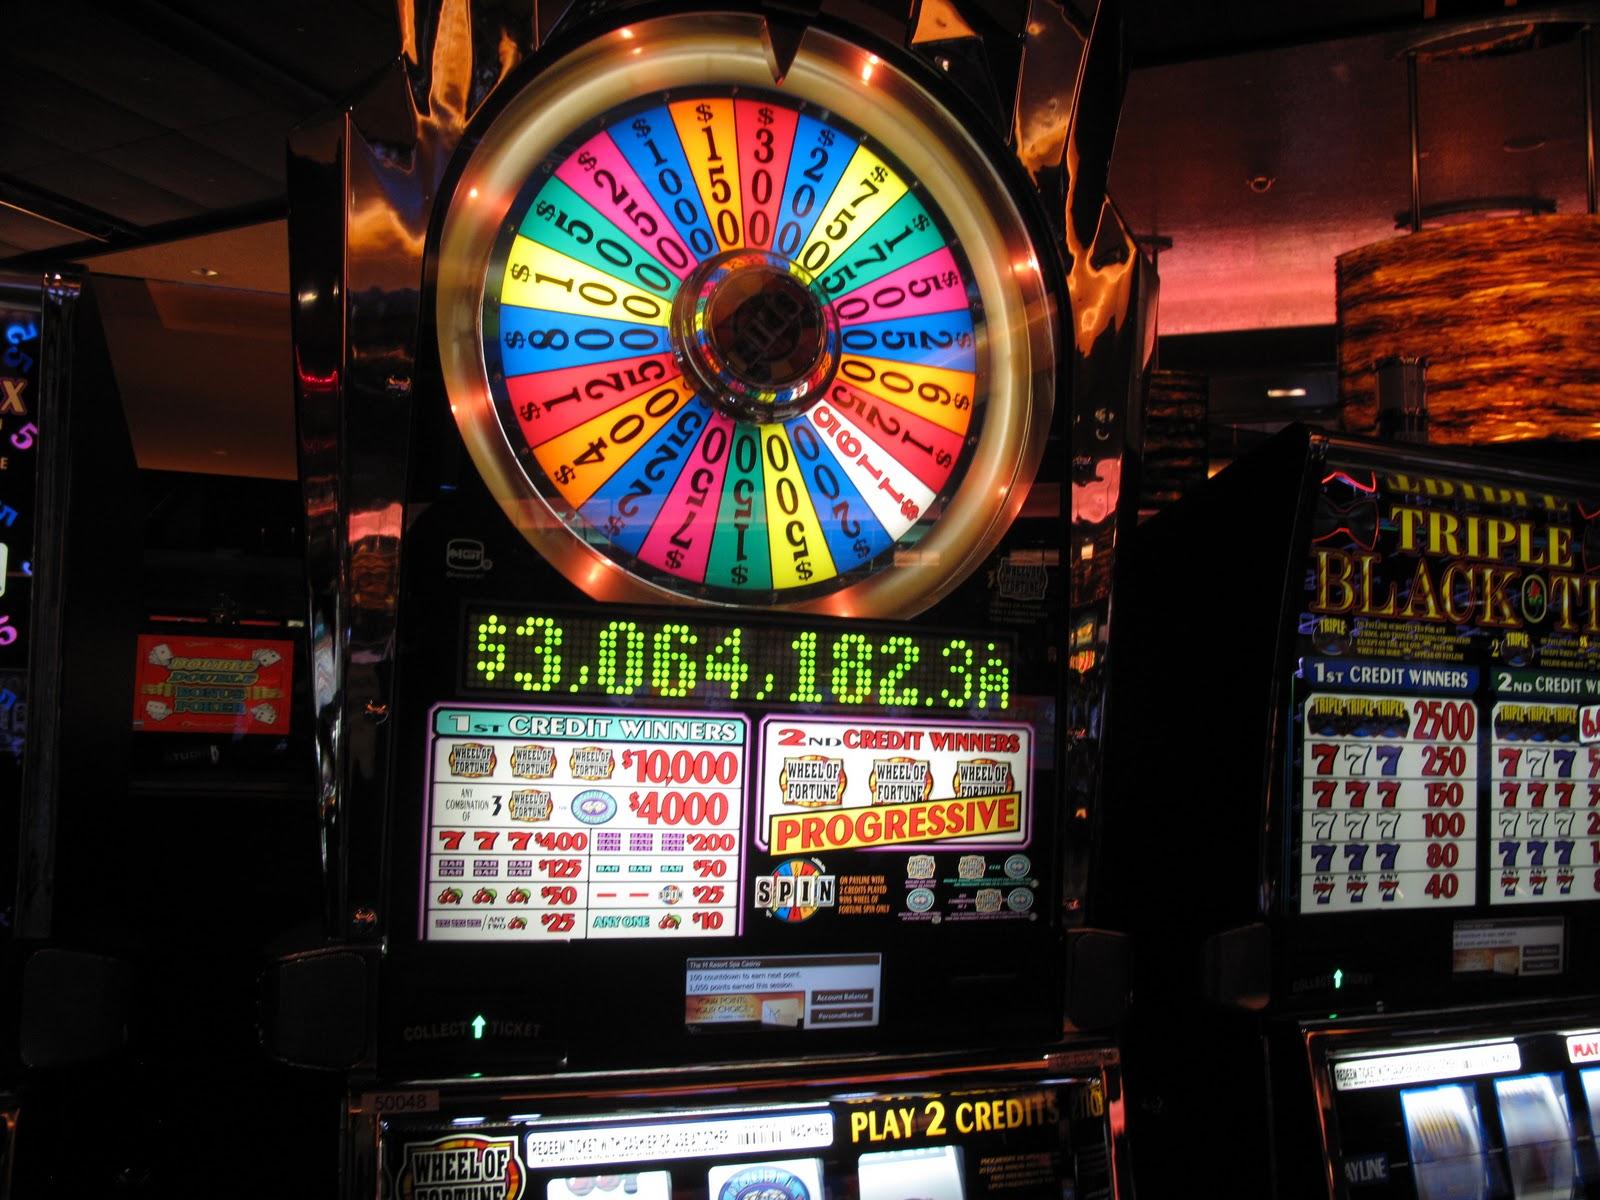 6 penny slot machine